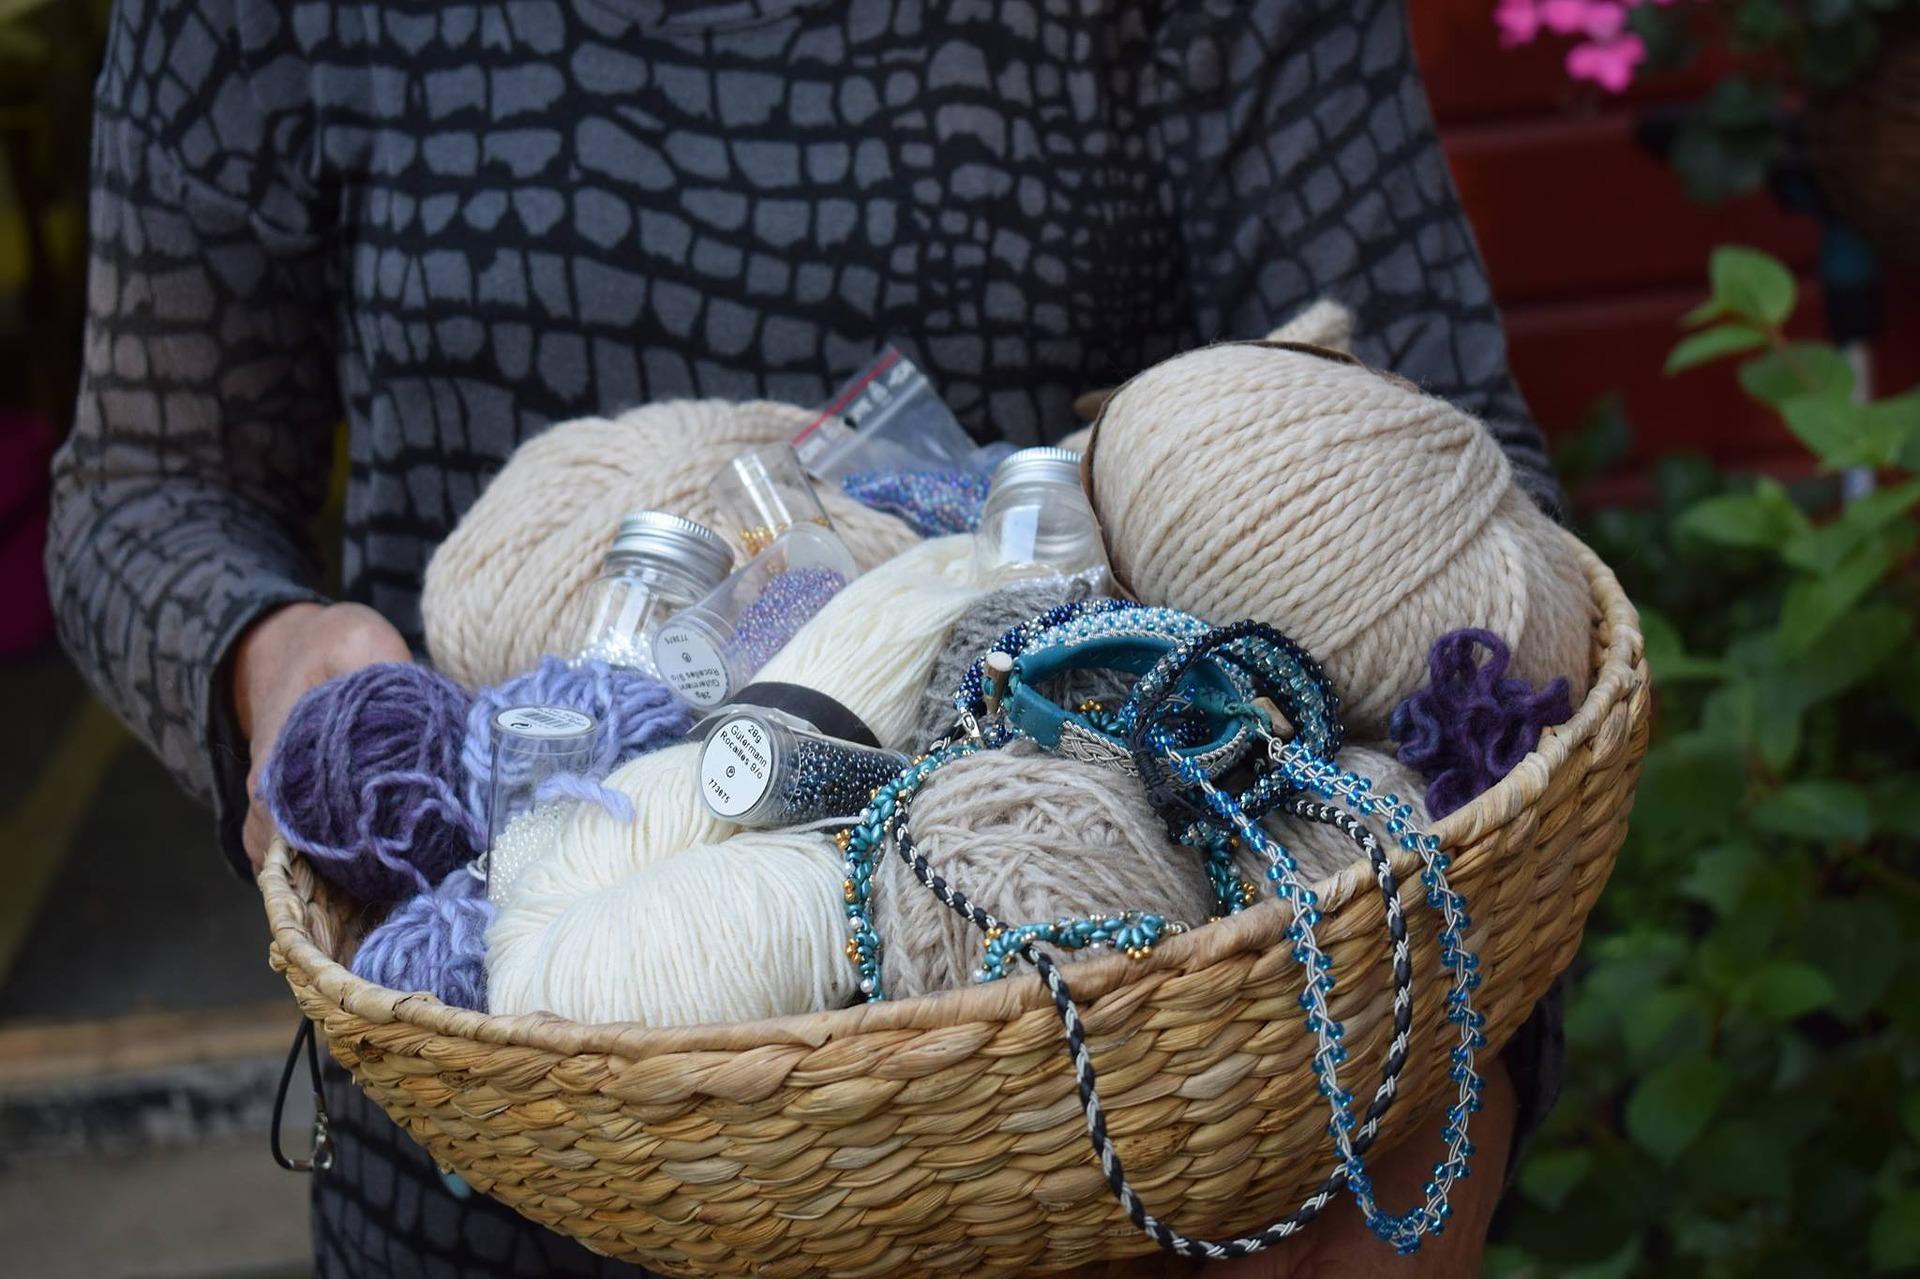 crafts-2373671_1920.jpg